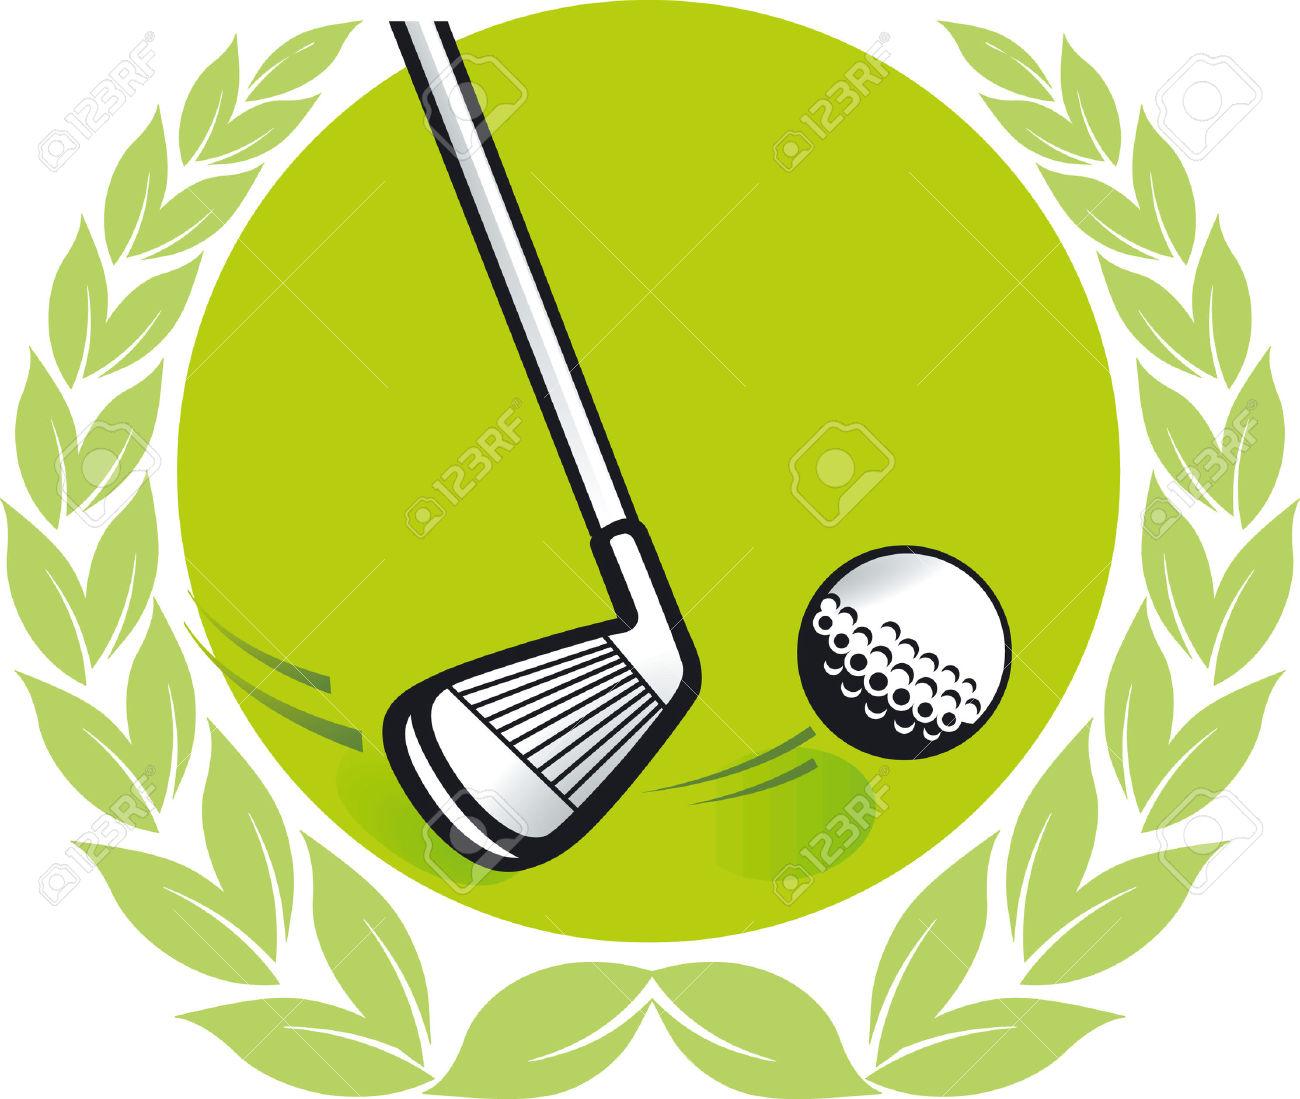 Free Golf Champion Cliparts, Download Free Clip Art, Free.